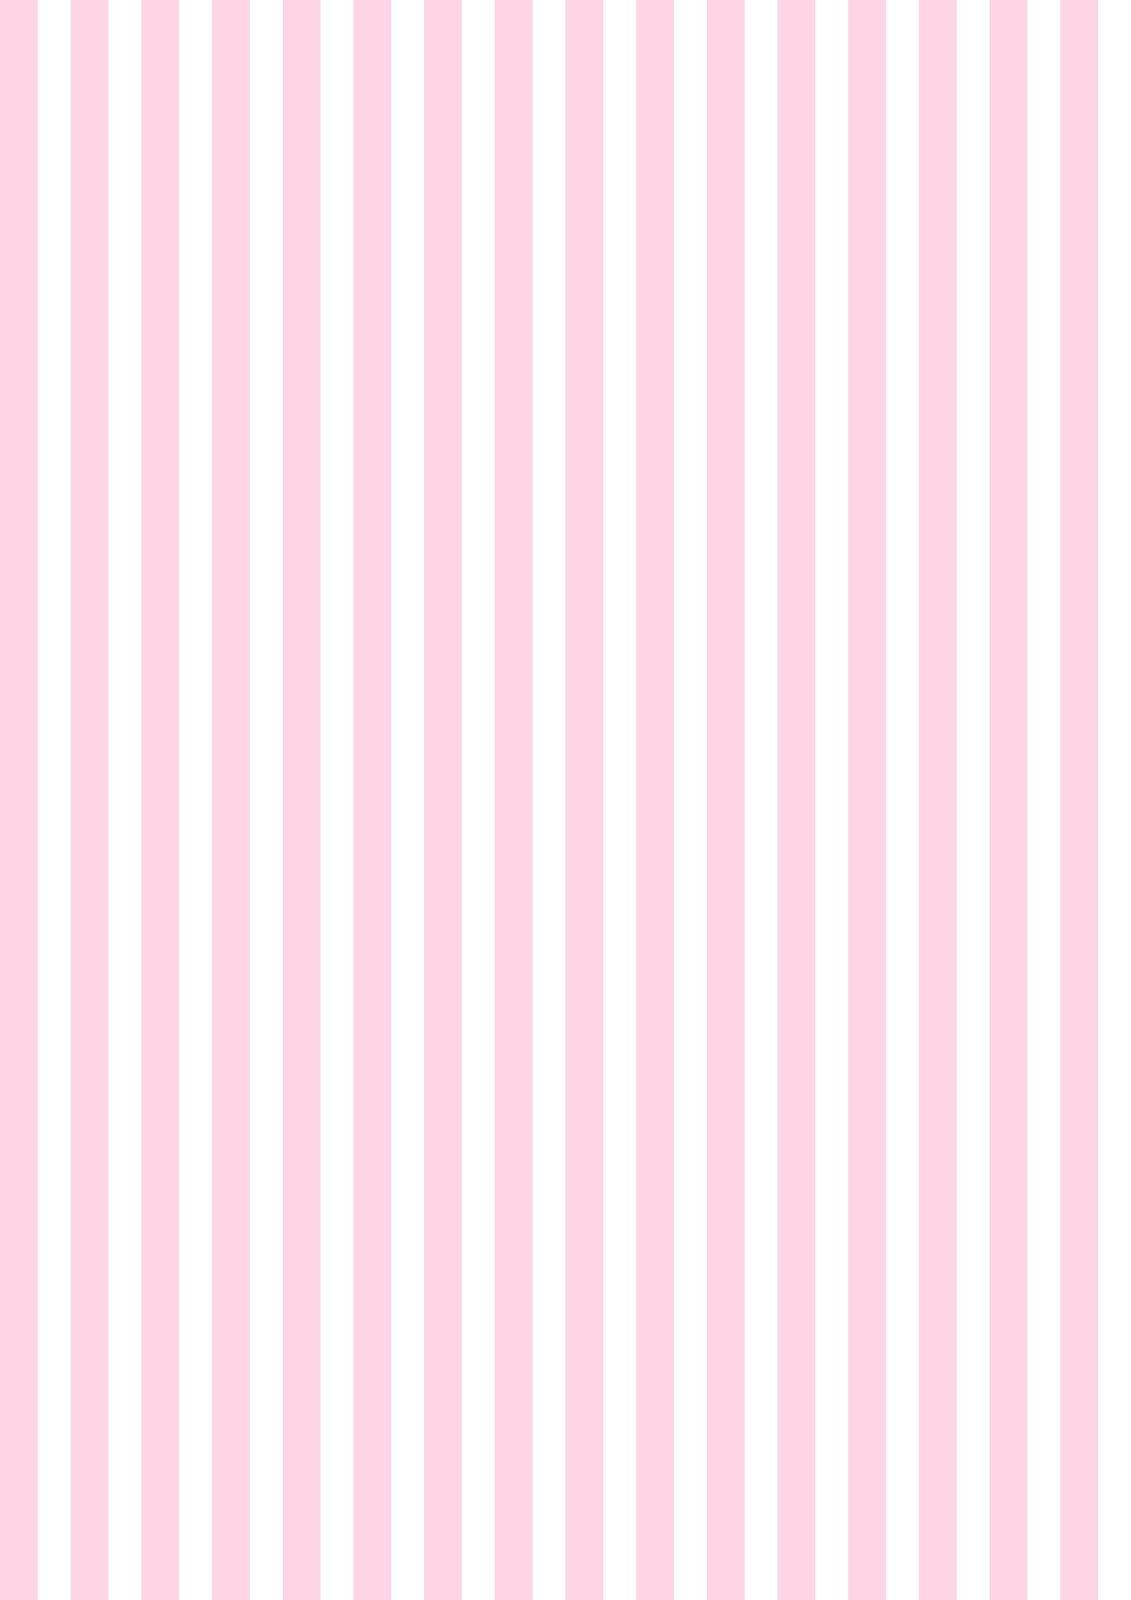 24 Pretty Photo Of Scrapbook Aesthetic Wallpaper Scrapbook Aesthetic Wallpaper Free Digital Striped Scrapbooki Pink Wallpaper Scrapbook Paper Cute Wallpapers Aesthetic pink and white grid wallpaper